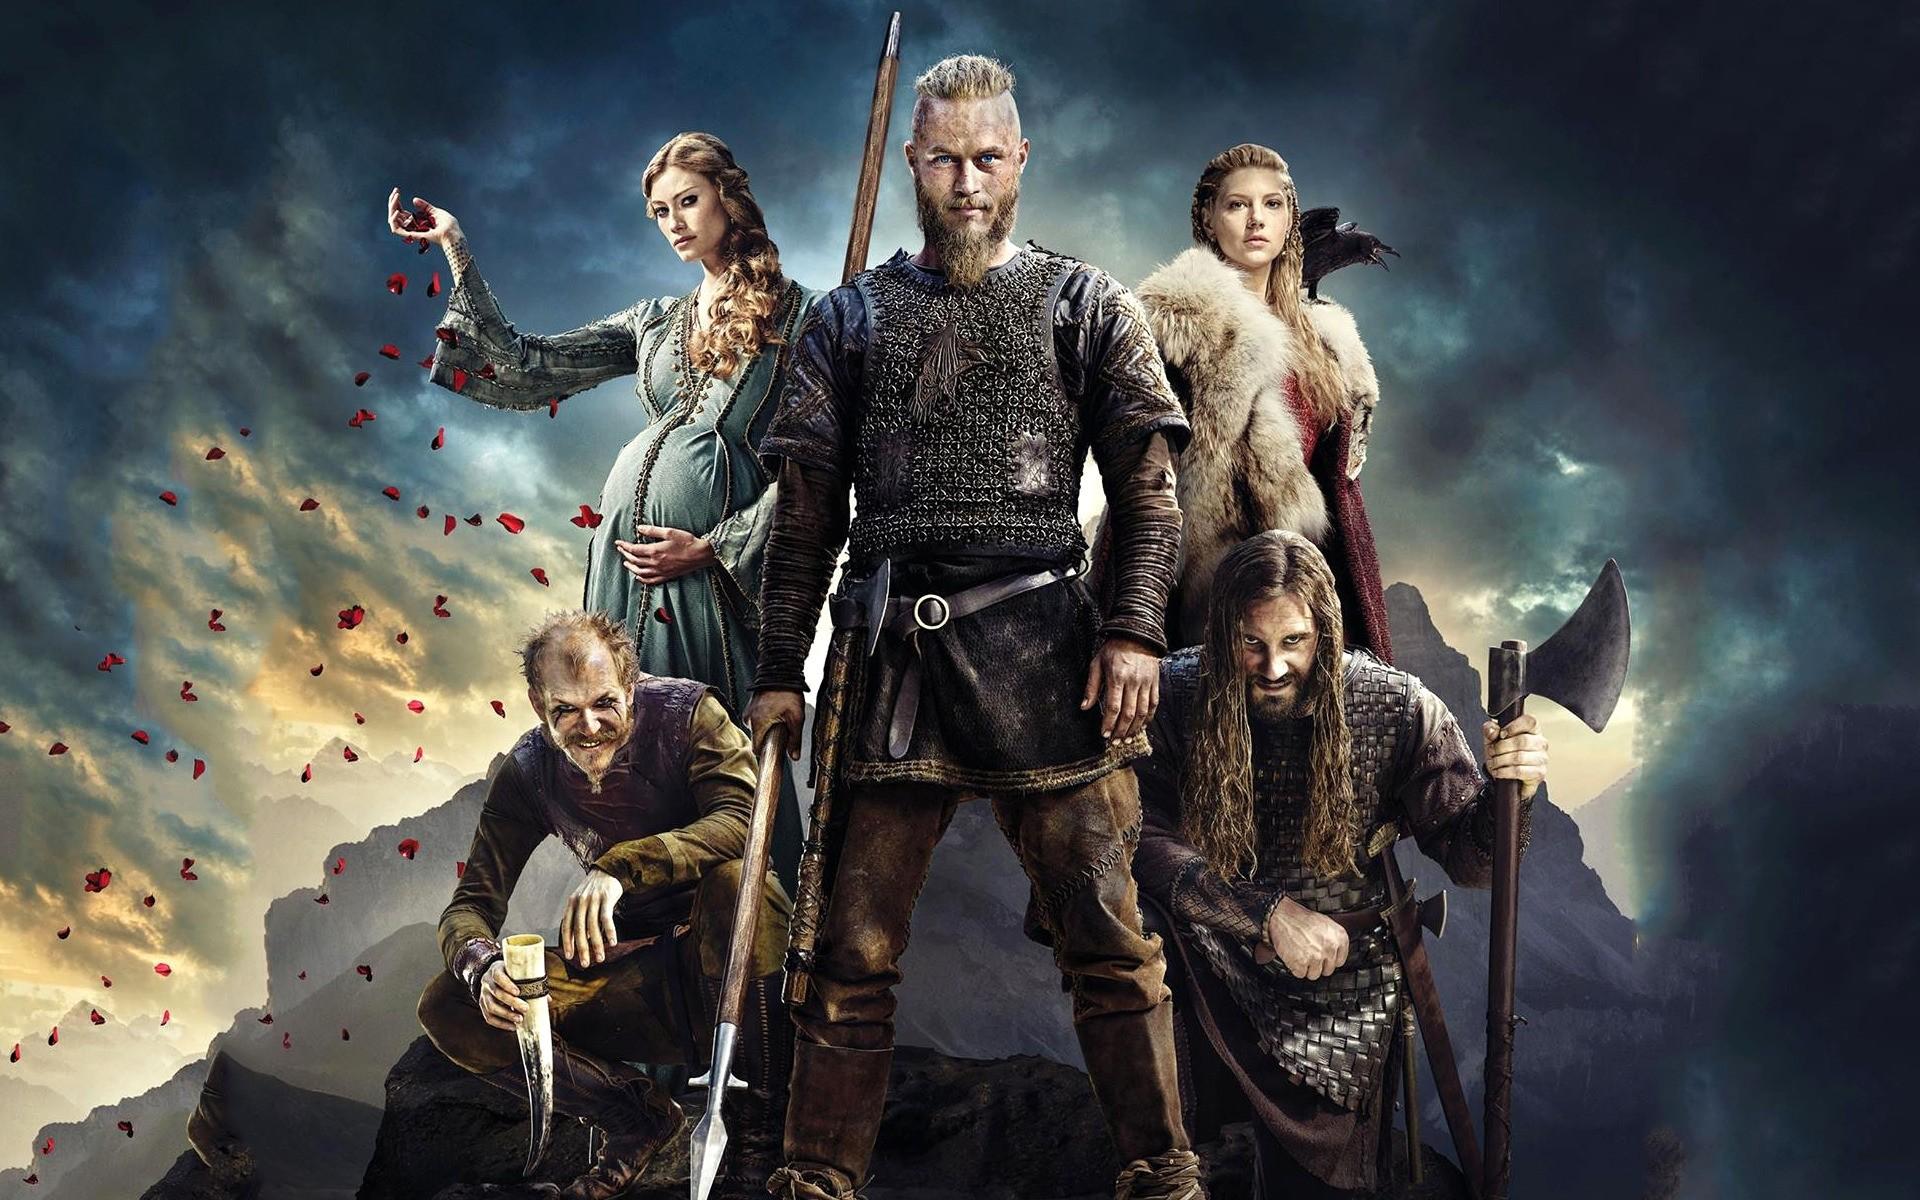 Ragnar Lothbrok Vikings HD Wallpaper Desktop Vikings HD Wallpapers Download  Free.